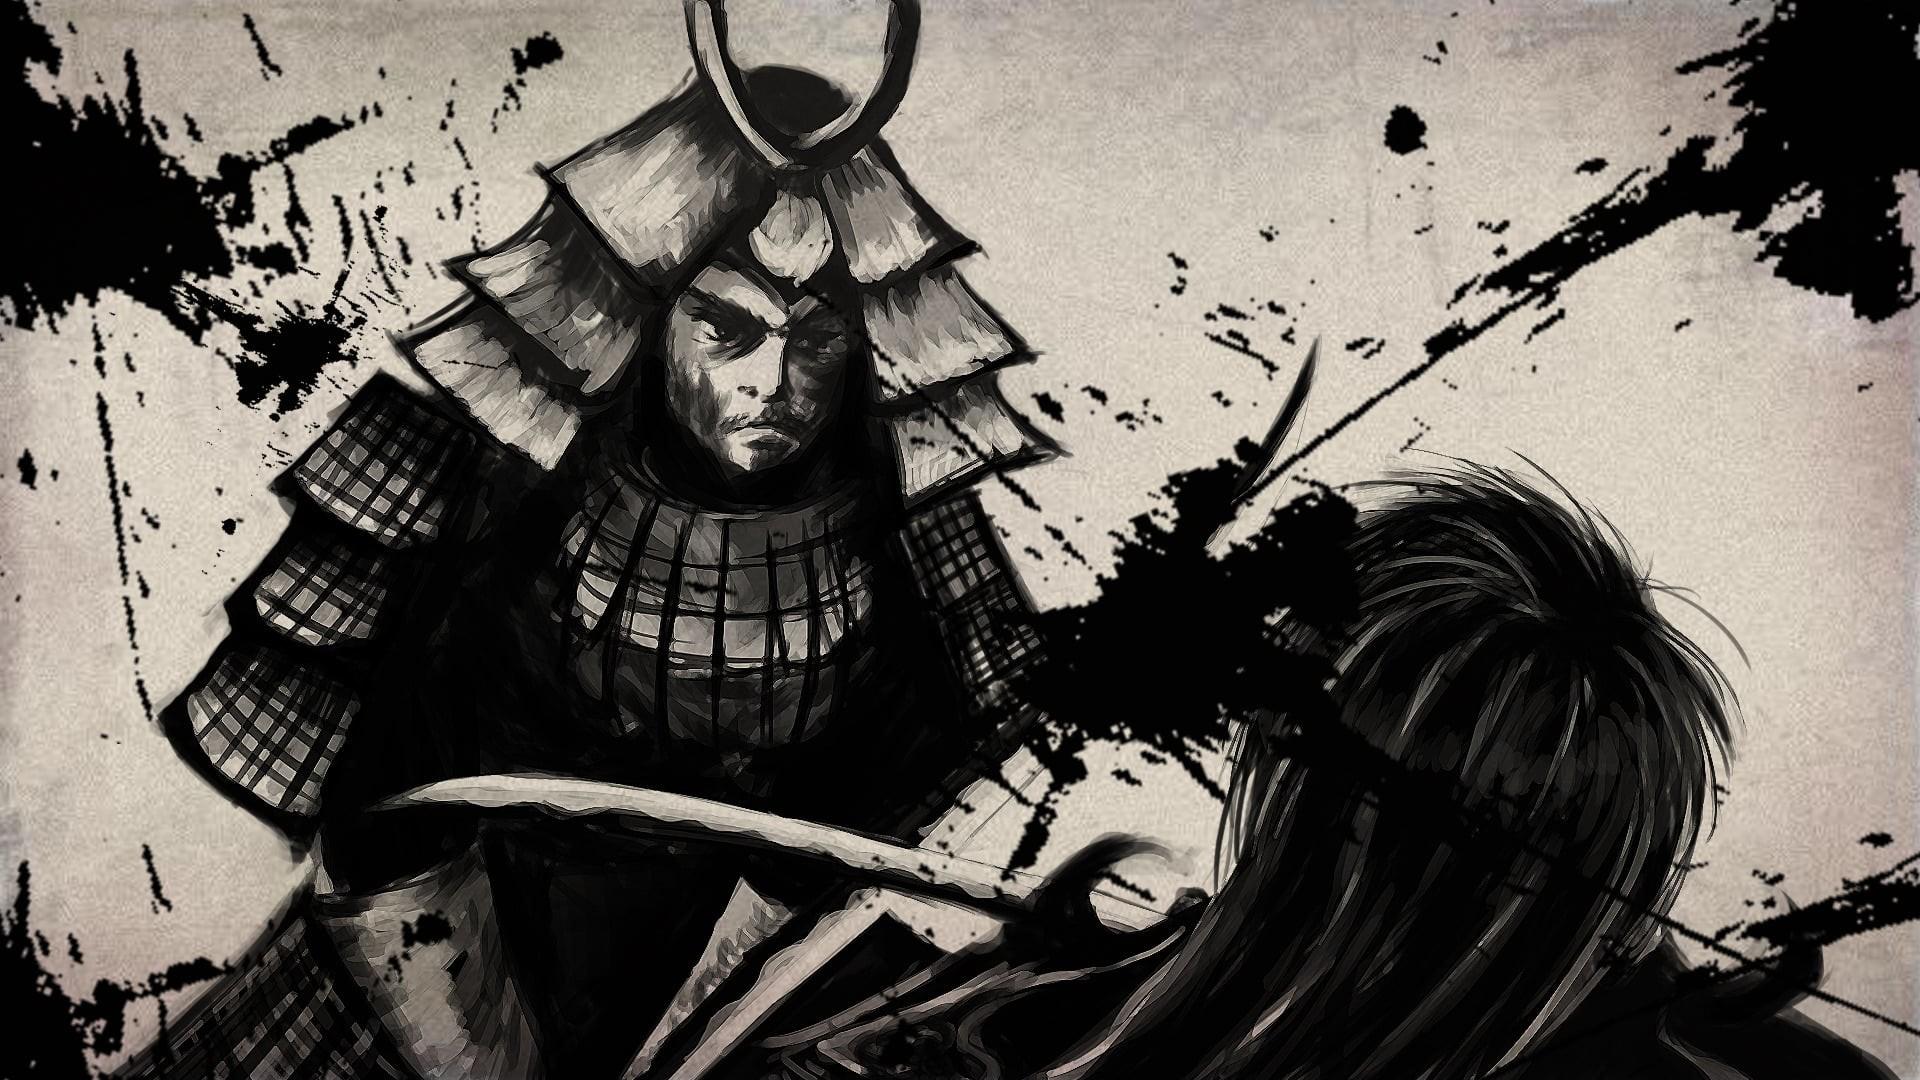 Samurai Wallpaper 1920x1080 75 Images